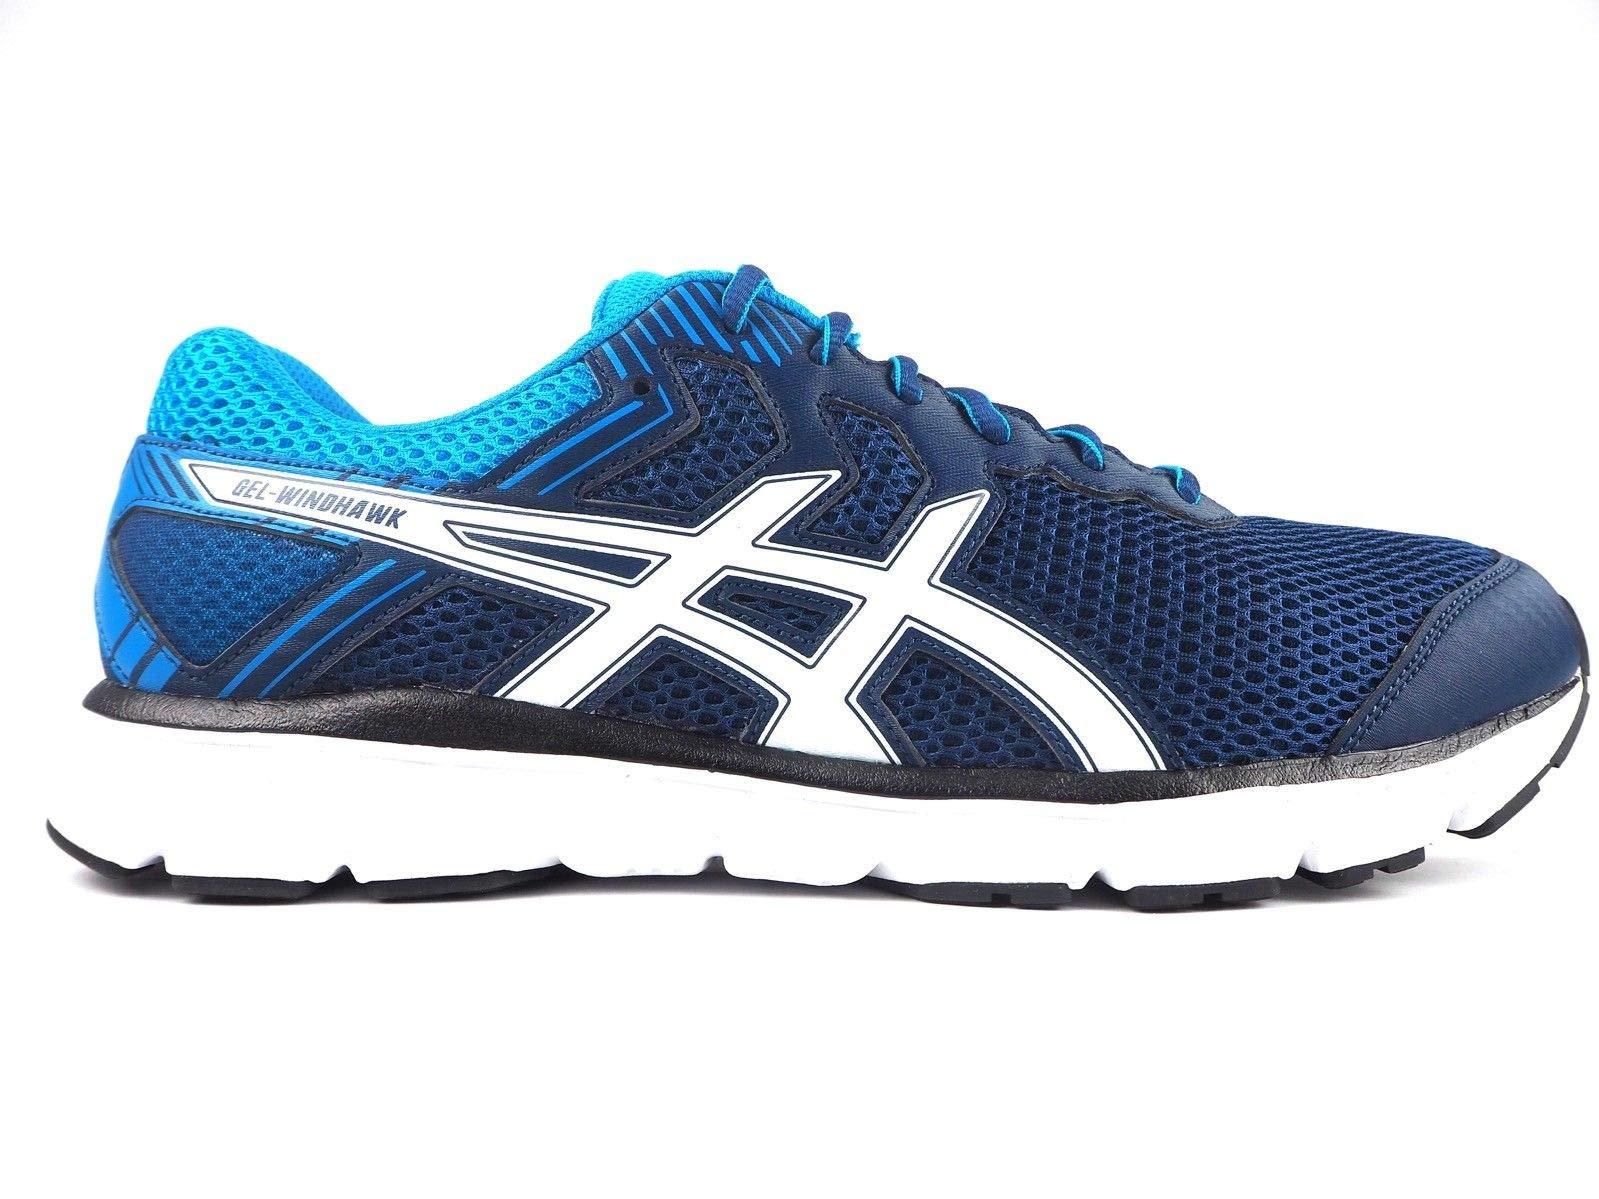 ASICS GEL-WINDHAWK Men's Running Shoes (T62VQ)- Buy Online in ...